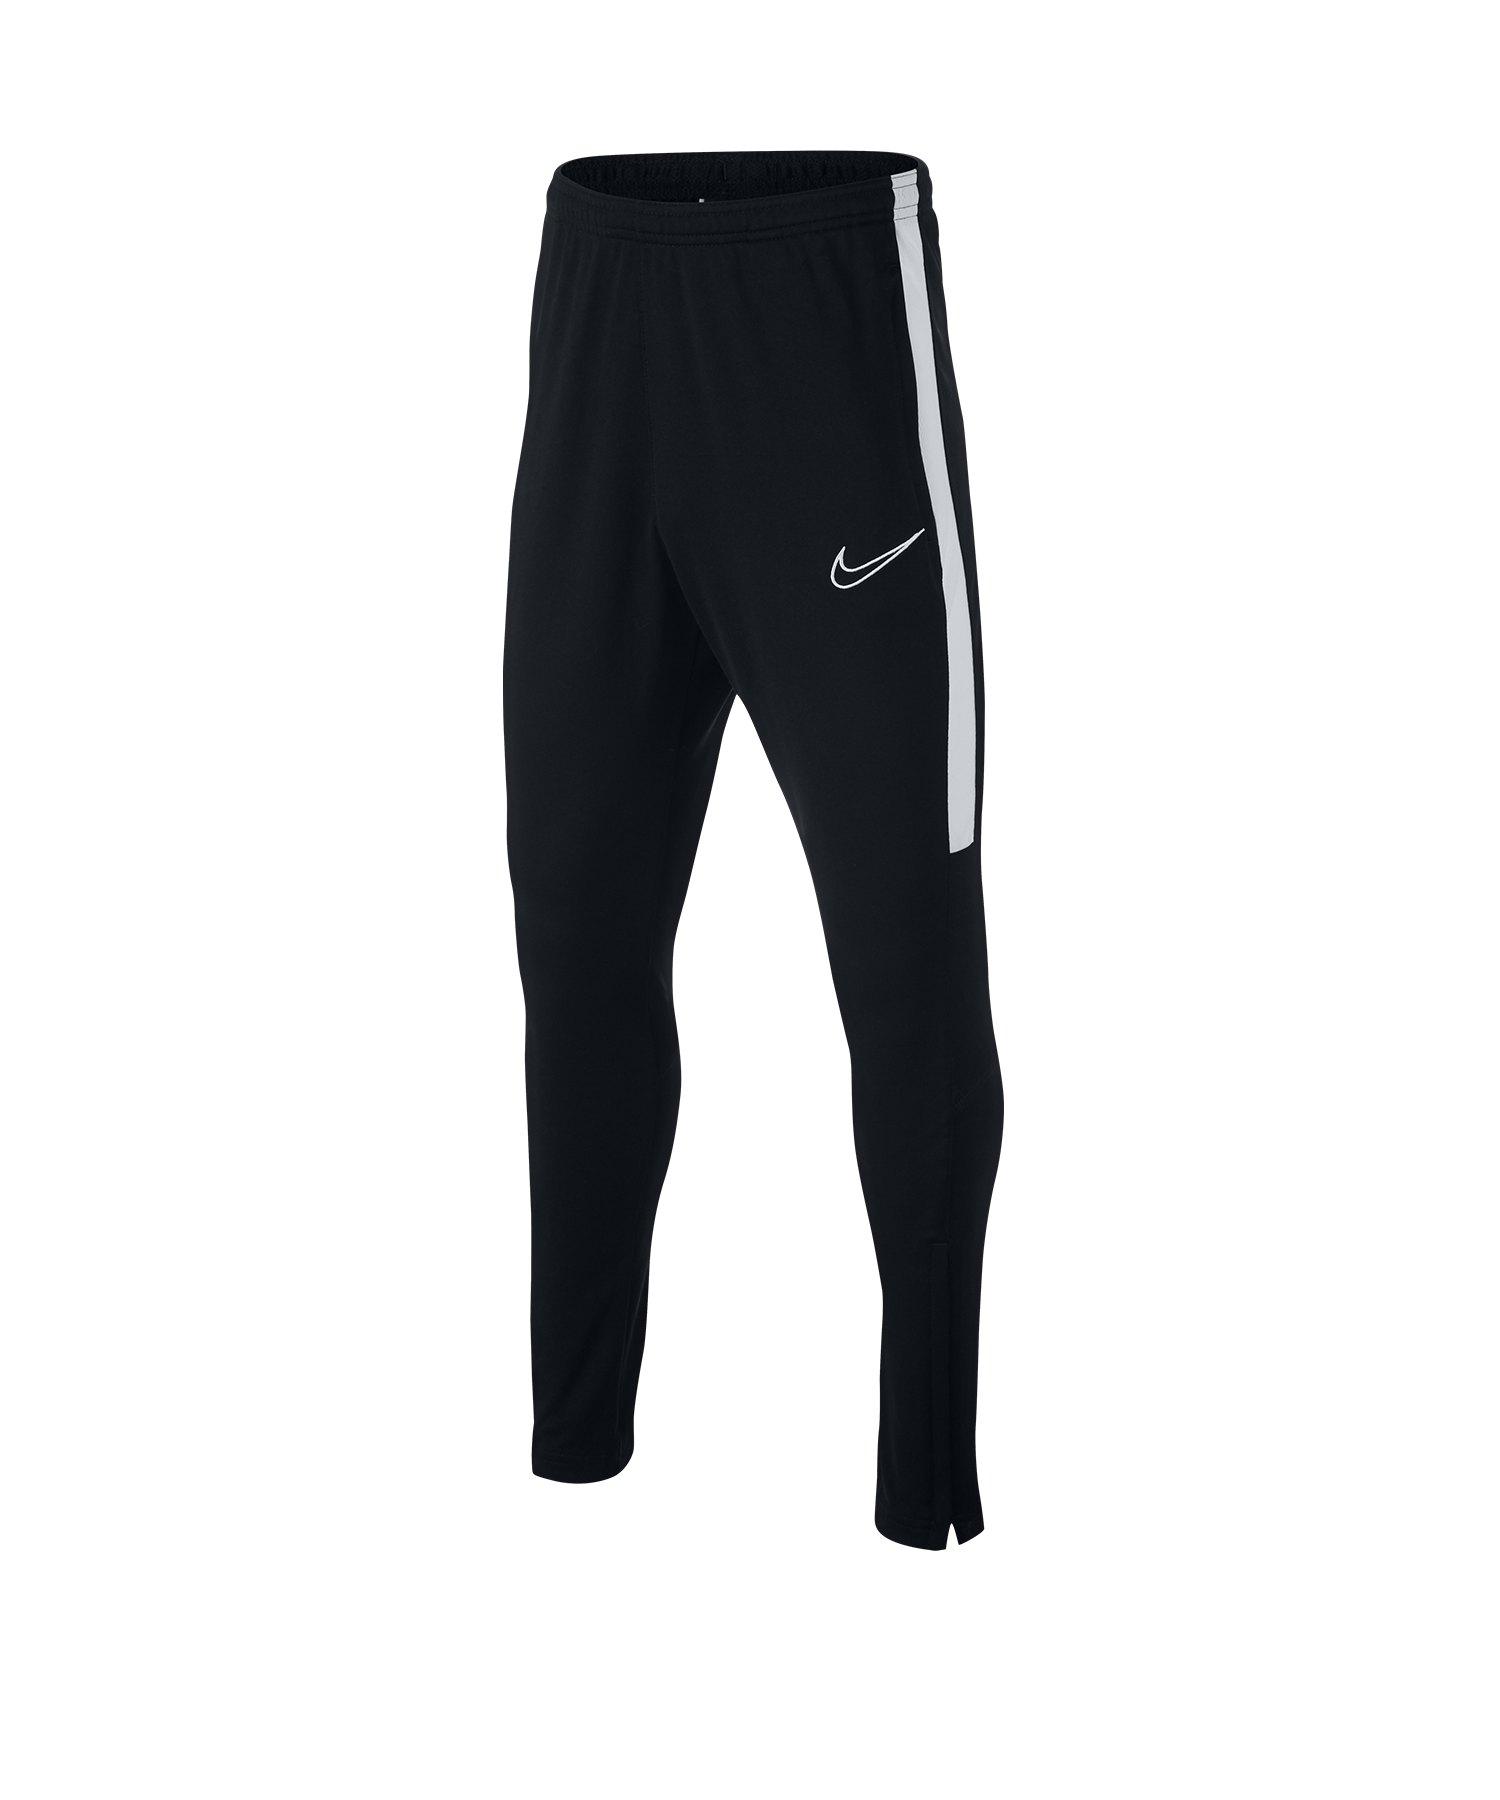 Nike Dry Academy Pant Jogginghose Kids F010 - schwarz